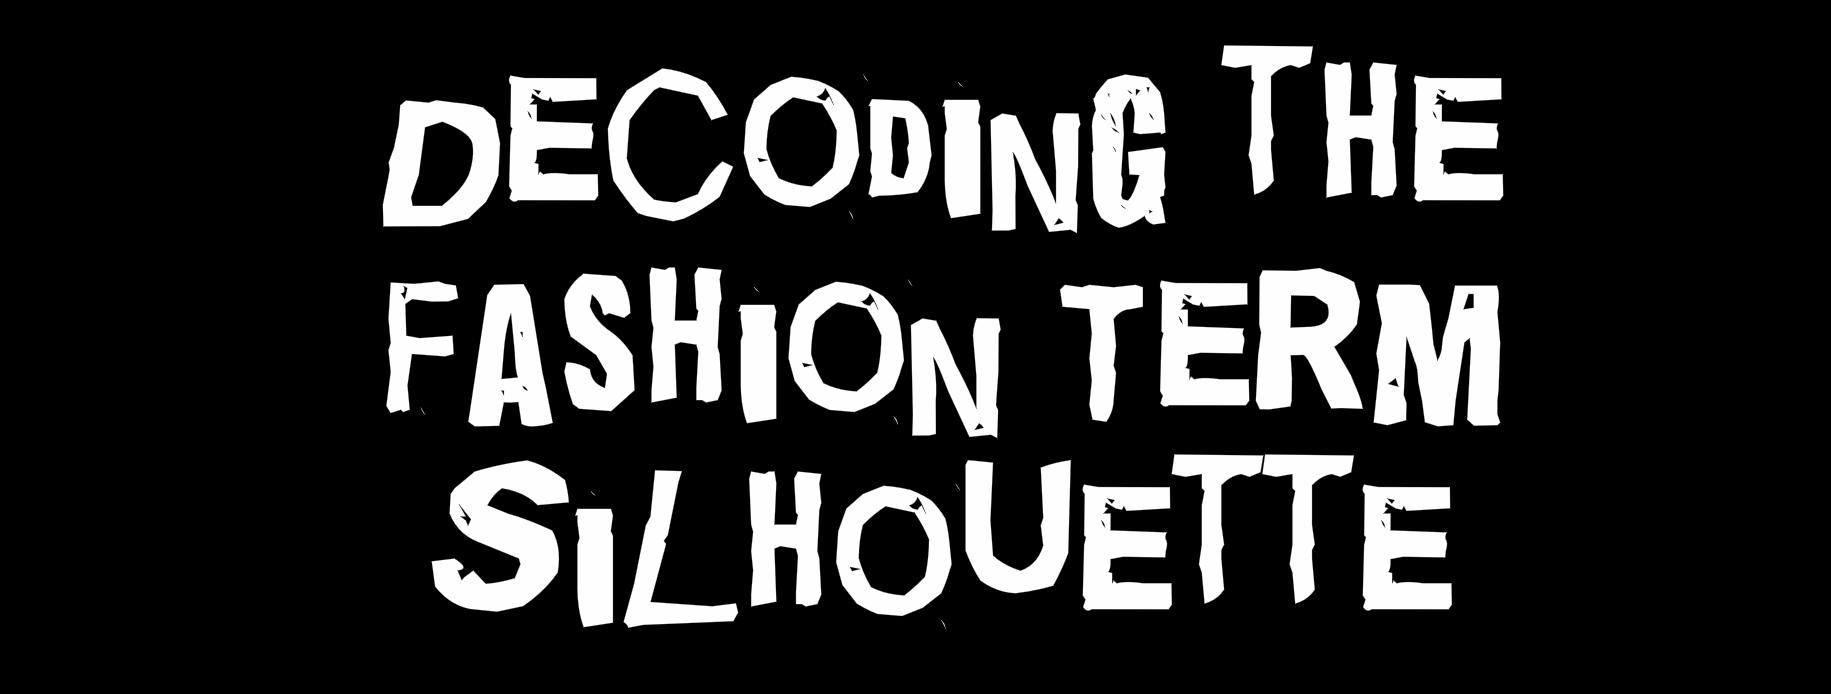 Decoding The Fashion Term Silhouette